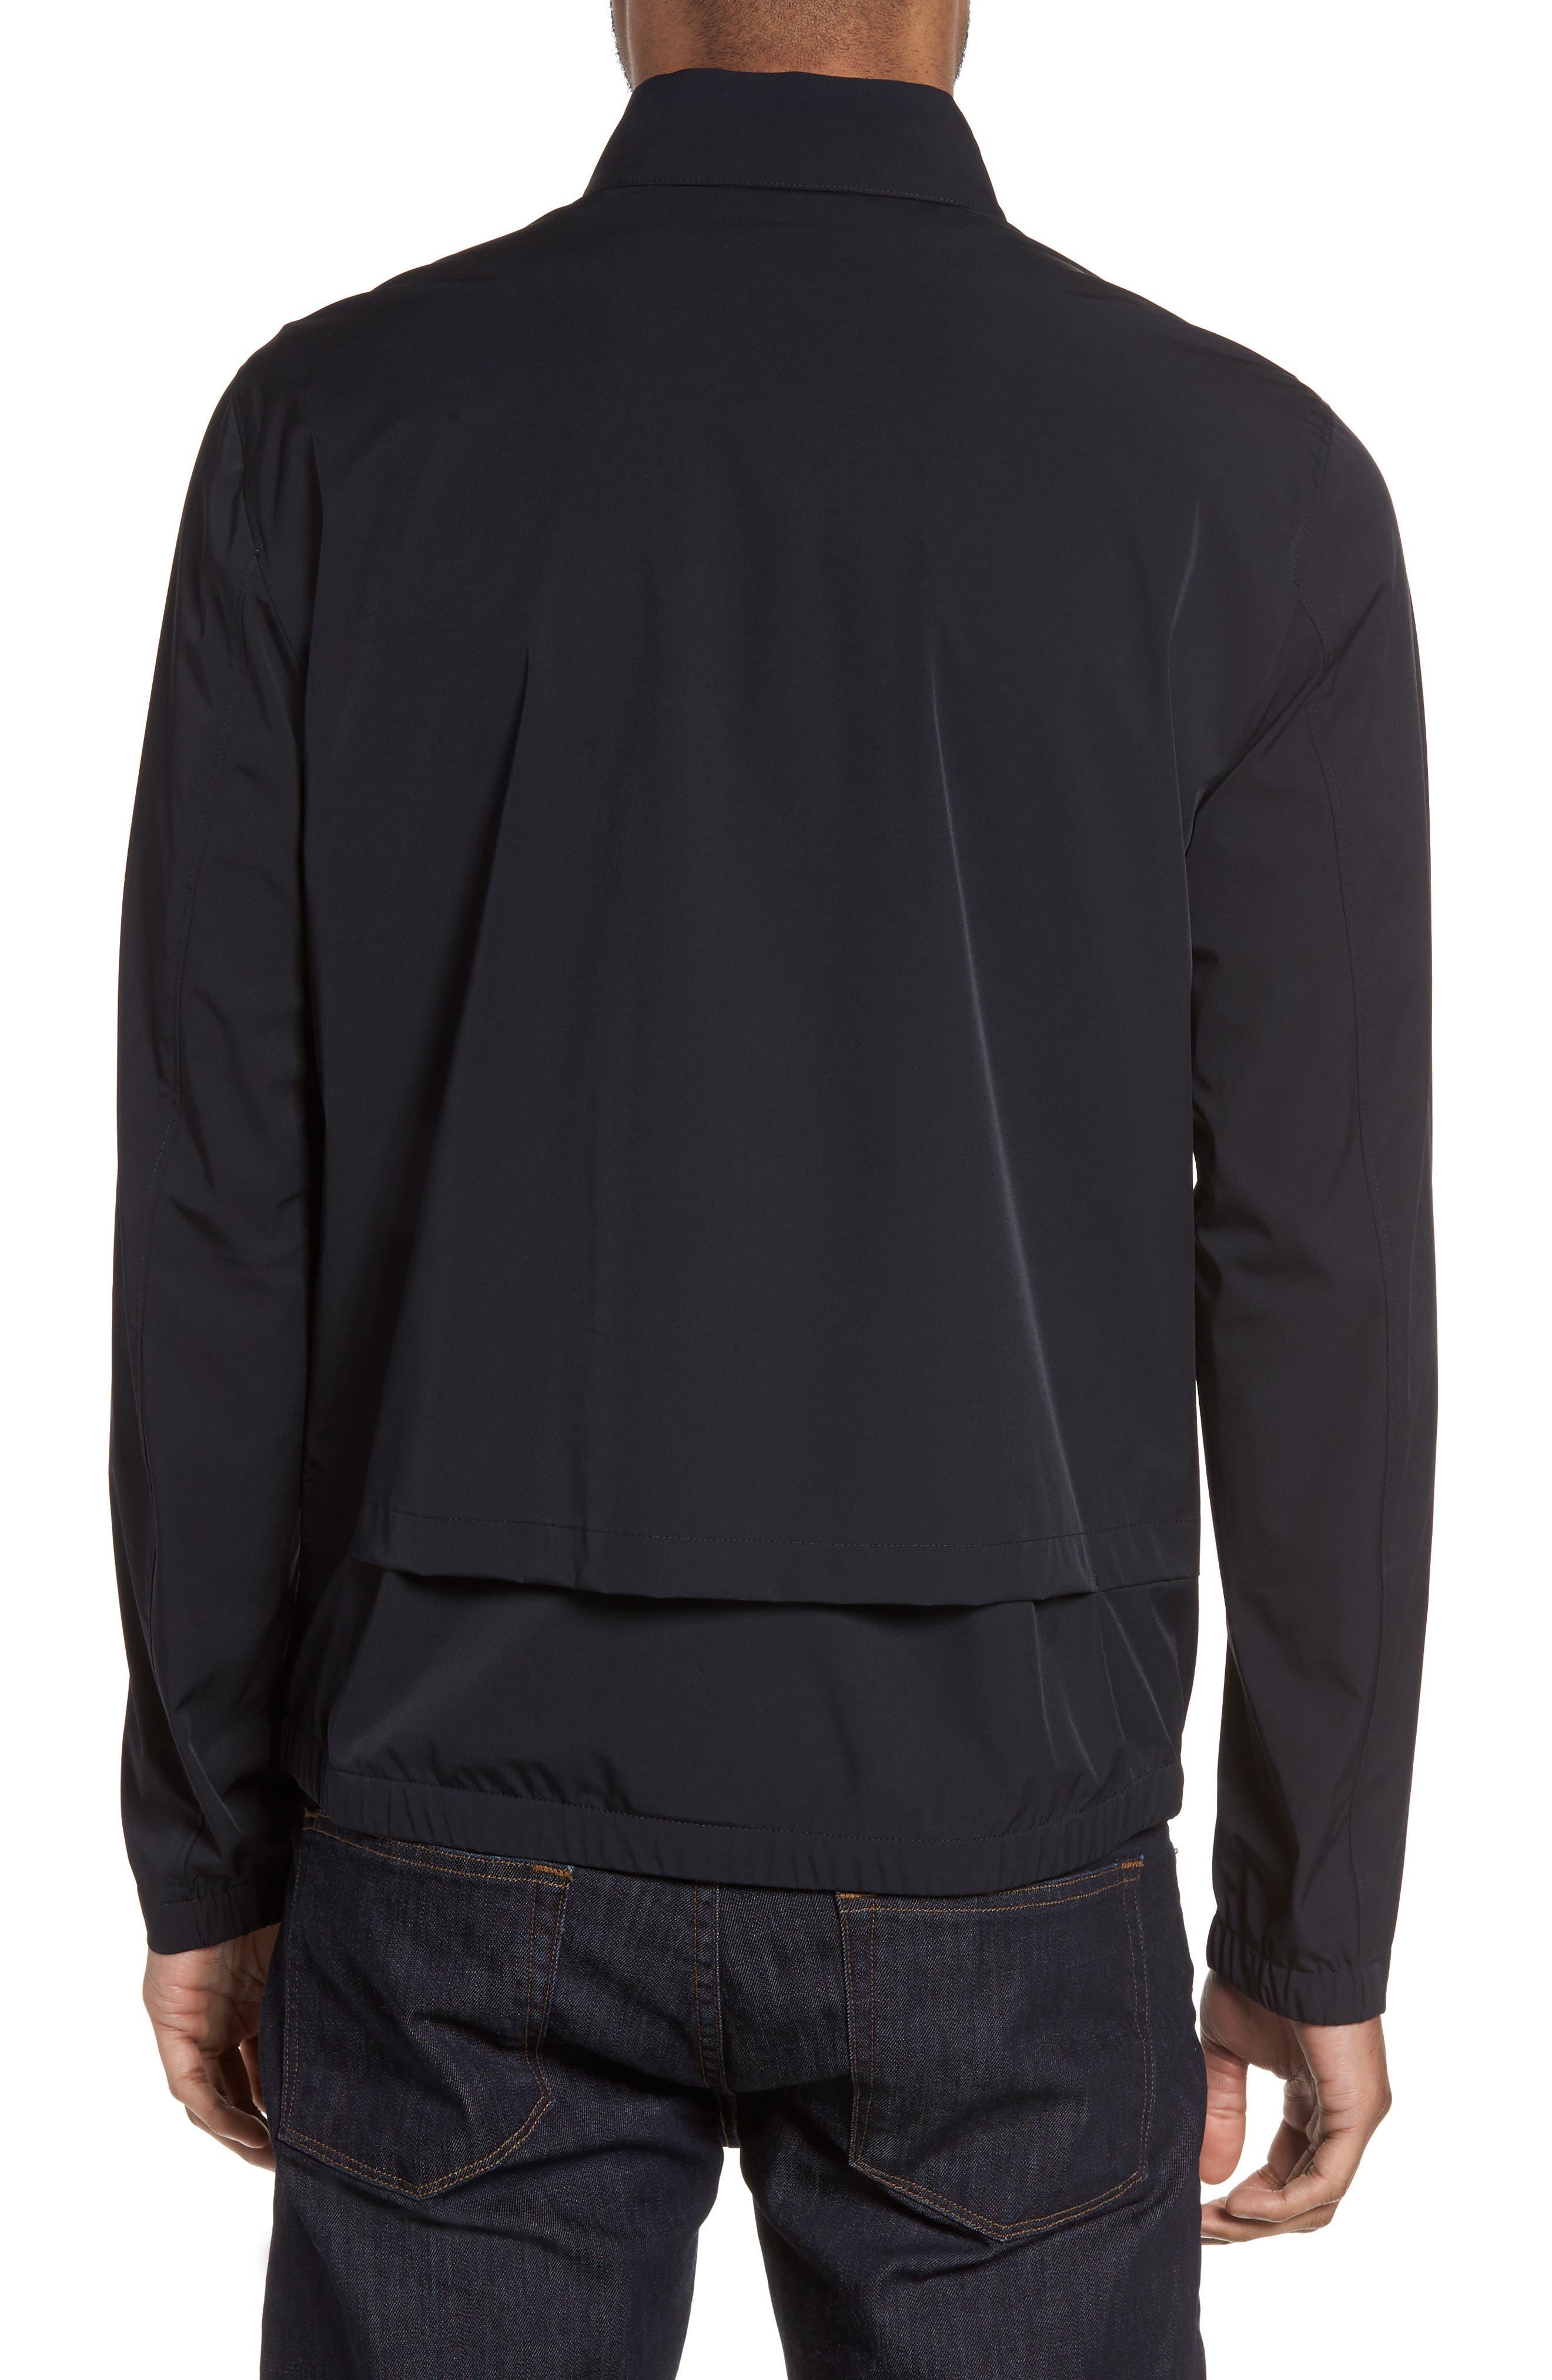 Scotty Bevan Zip Front Jacket,                             Alternate thumbnail 2, color,                             Eclipse